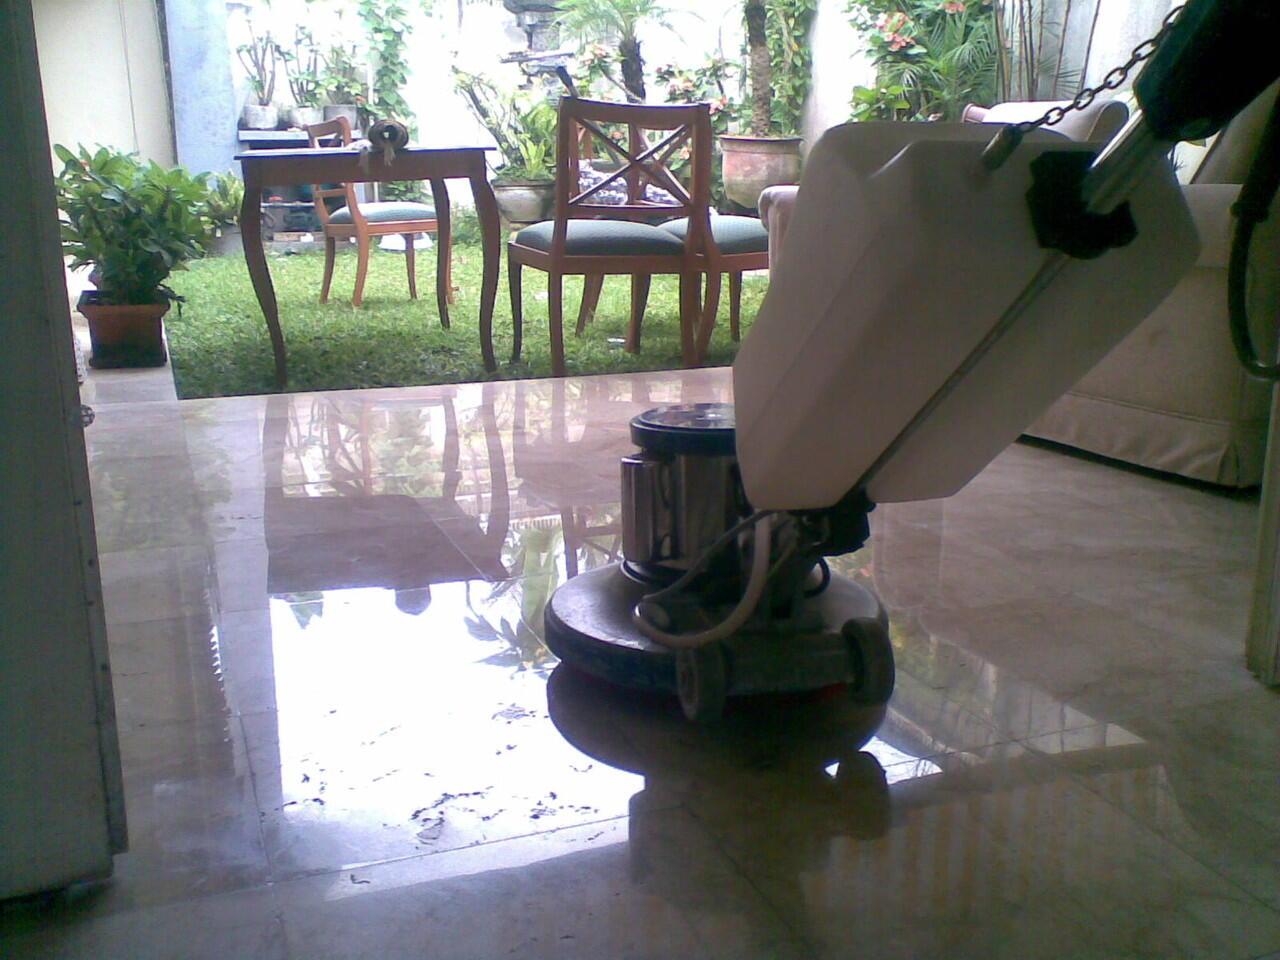 Housekeeping Chemical & Equipment di Bali